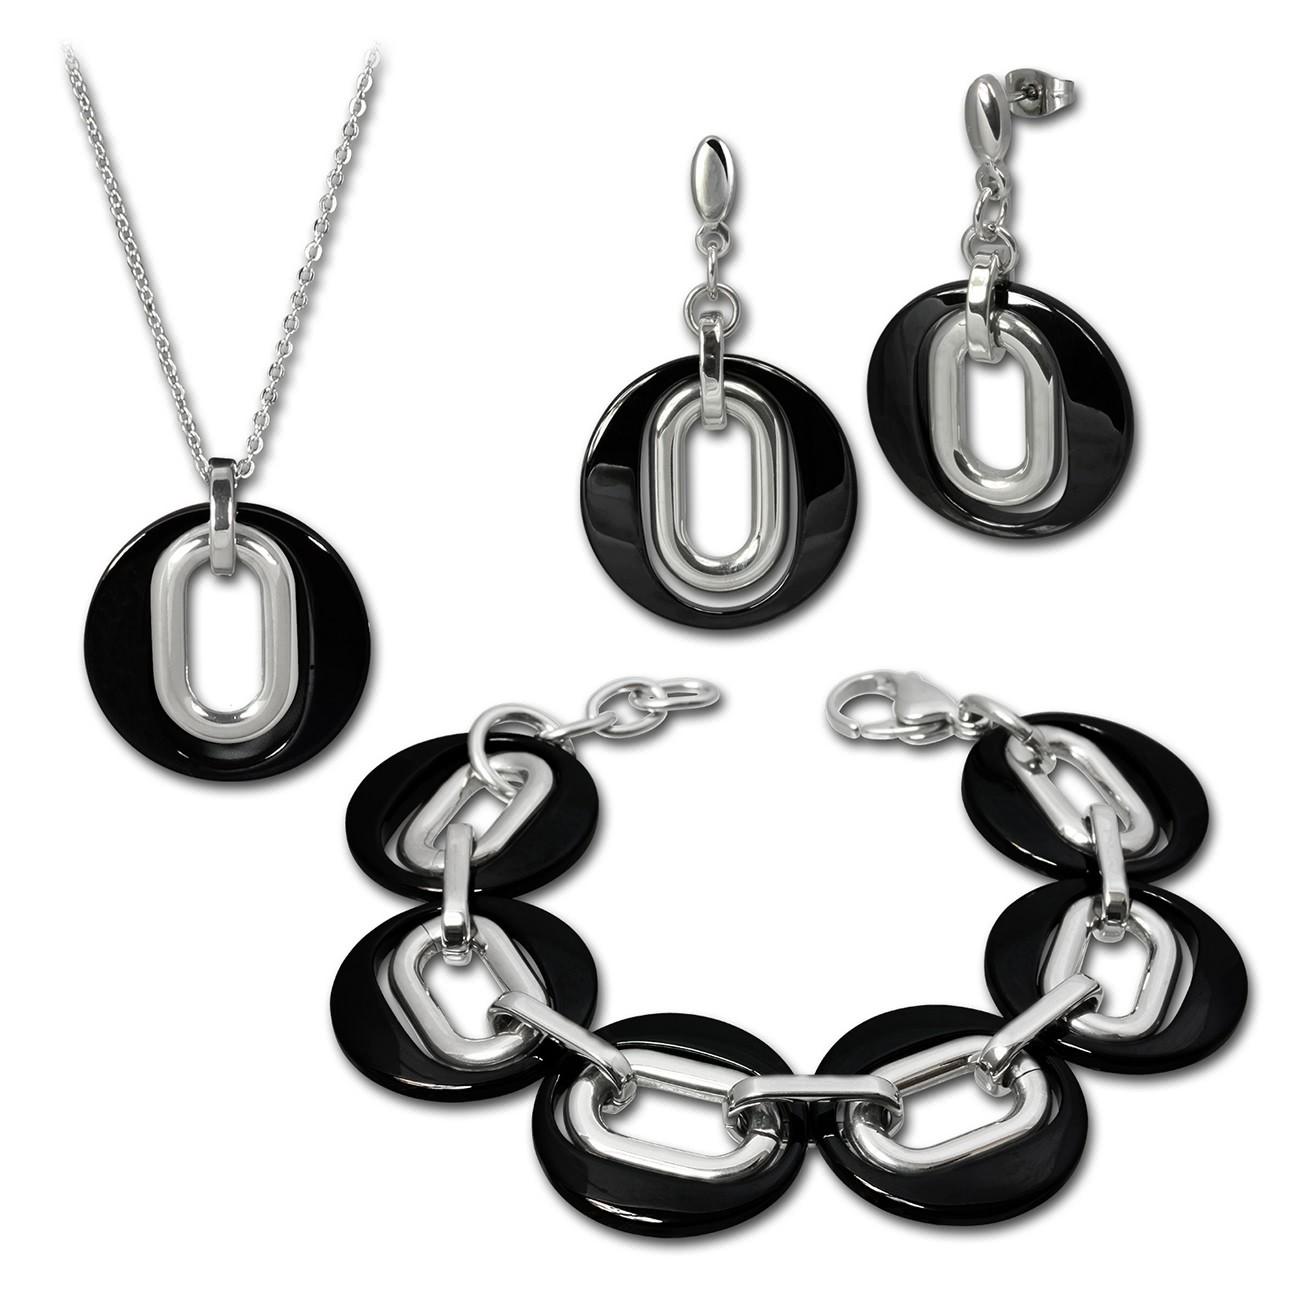 Amello Edelstahlschmuckset Keramik Kette, Armband, Ohrring ESSX03S